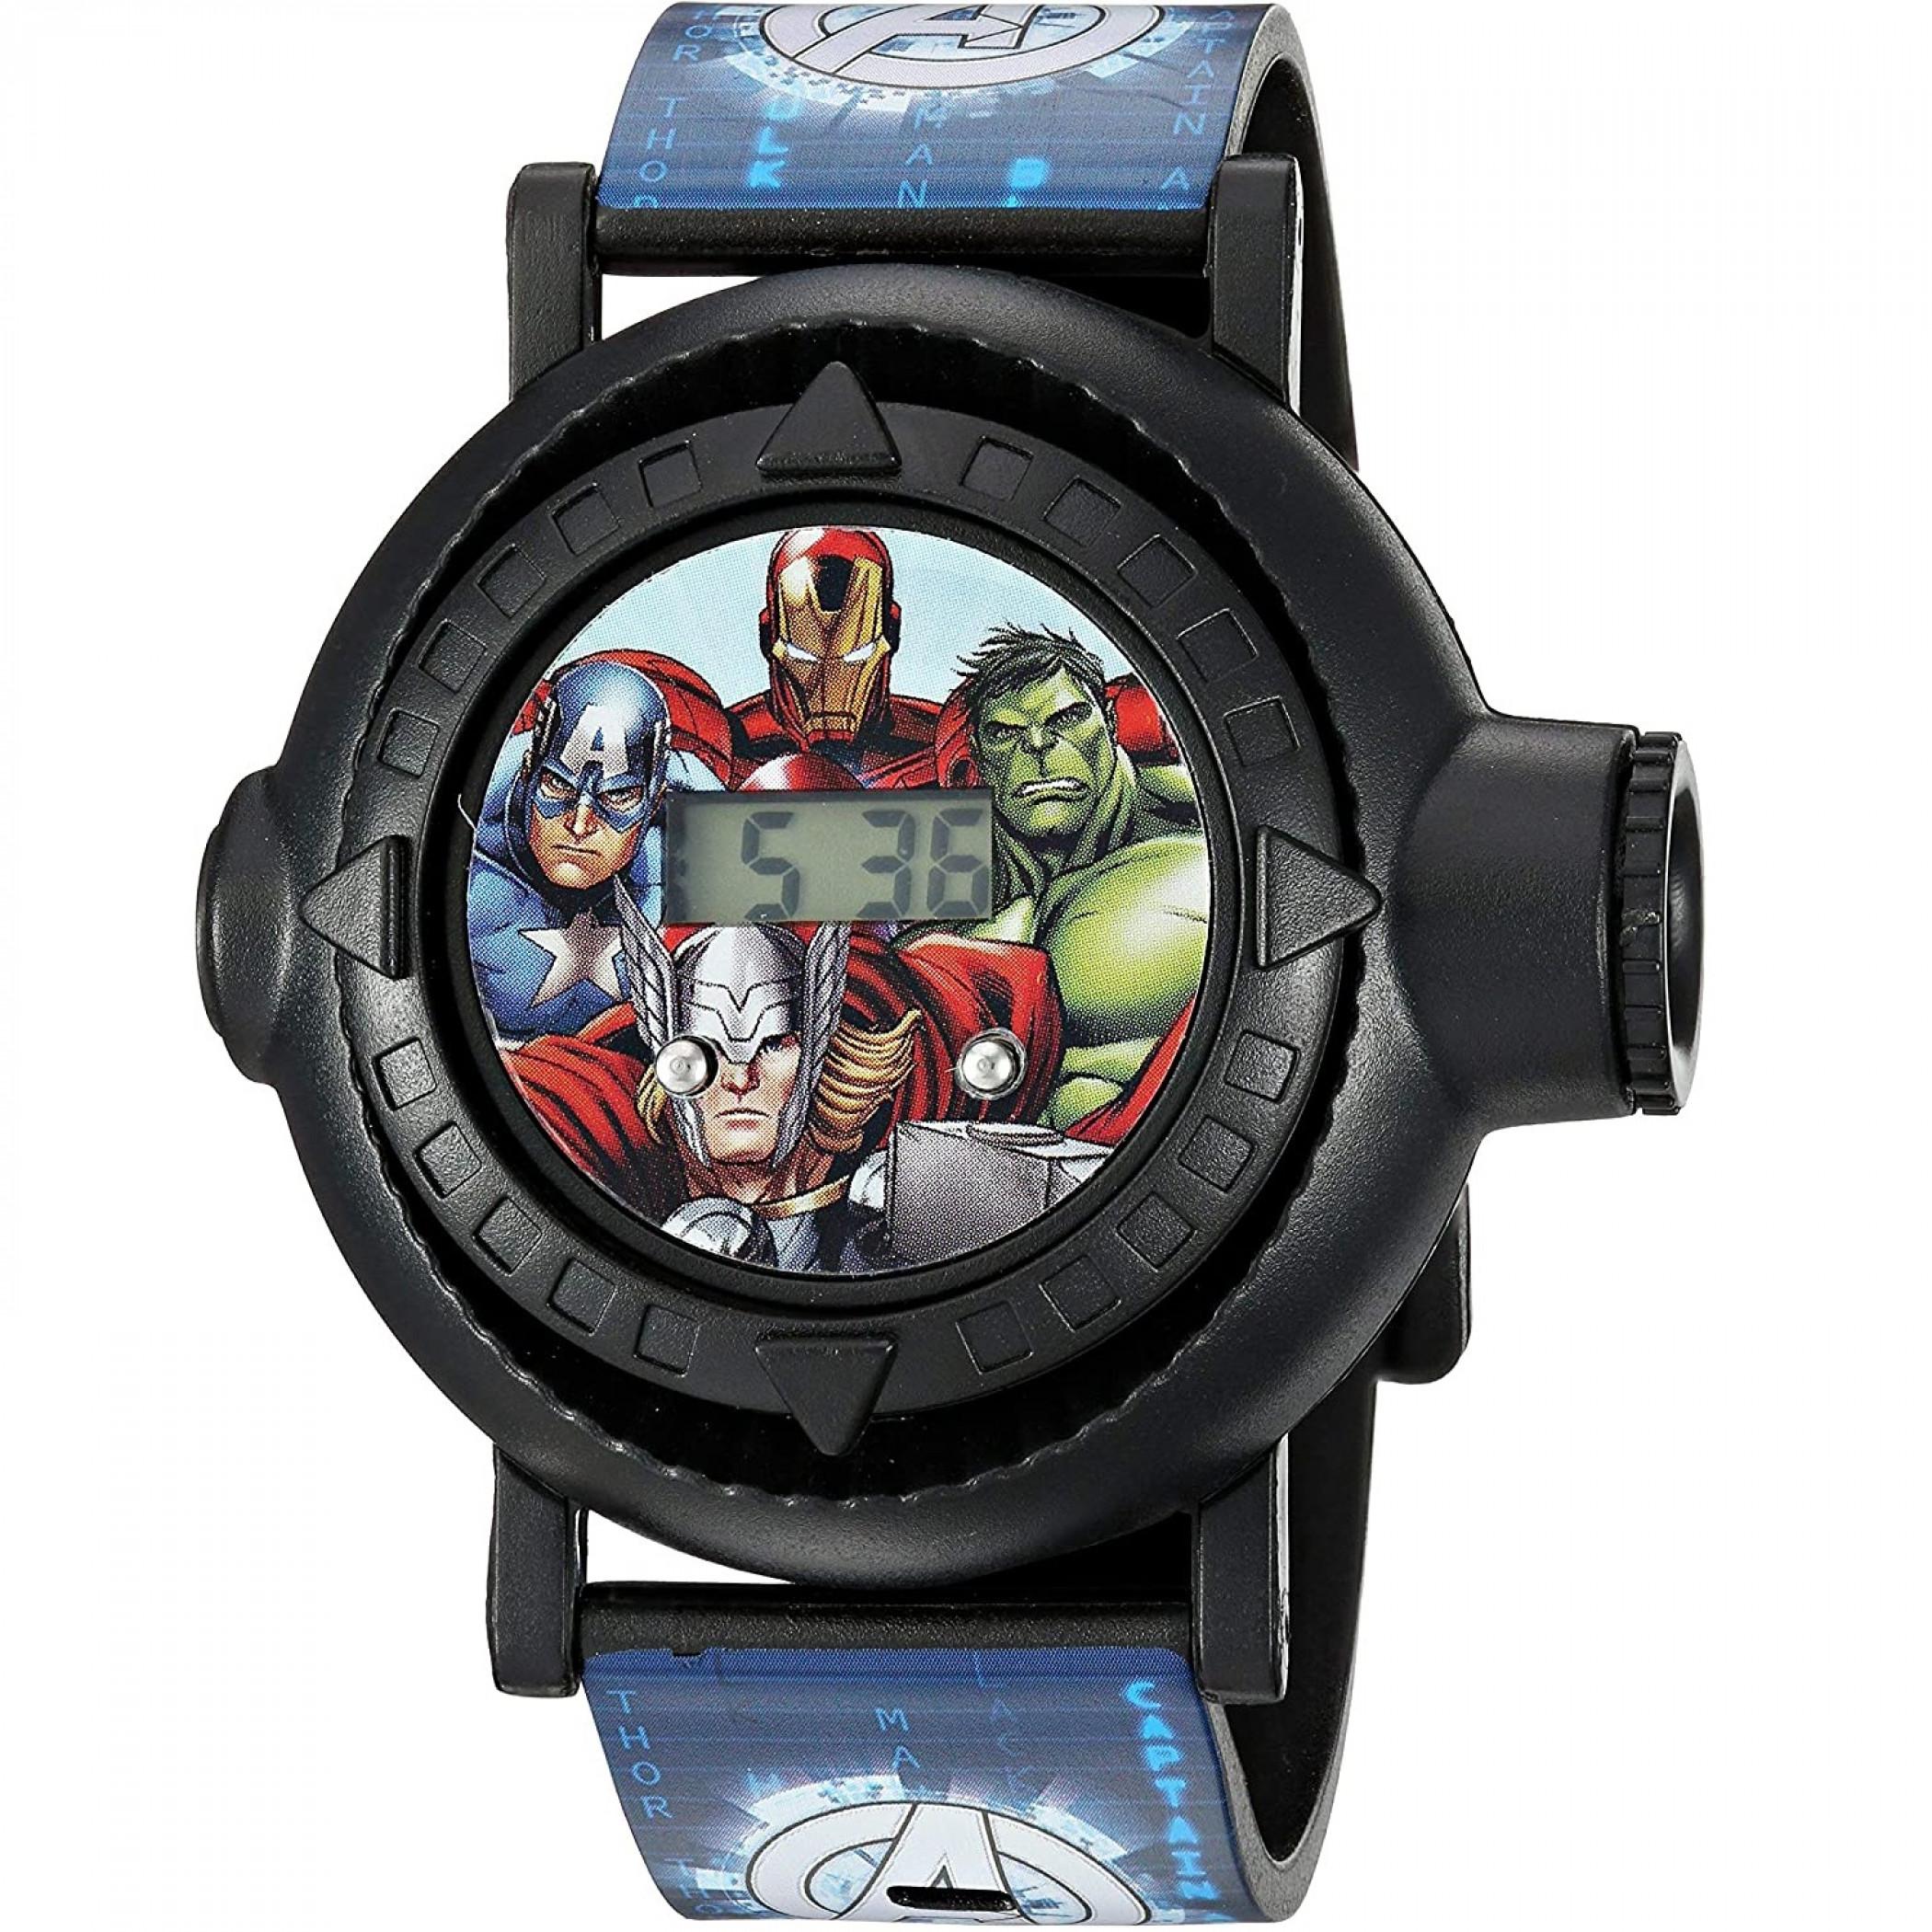 Marvel Avengers Earth's Mightiest Heroes Kids Digital Wristwatch